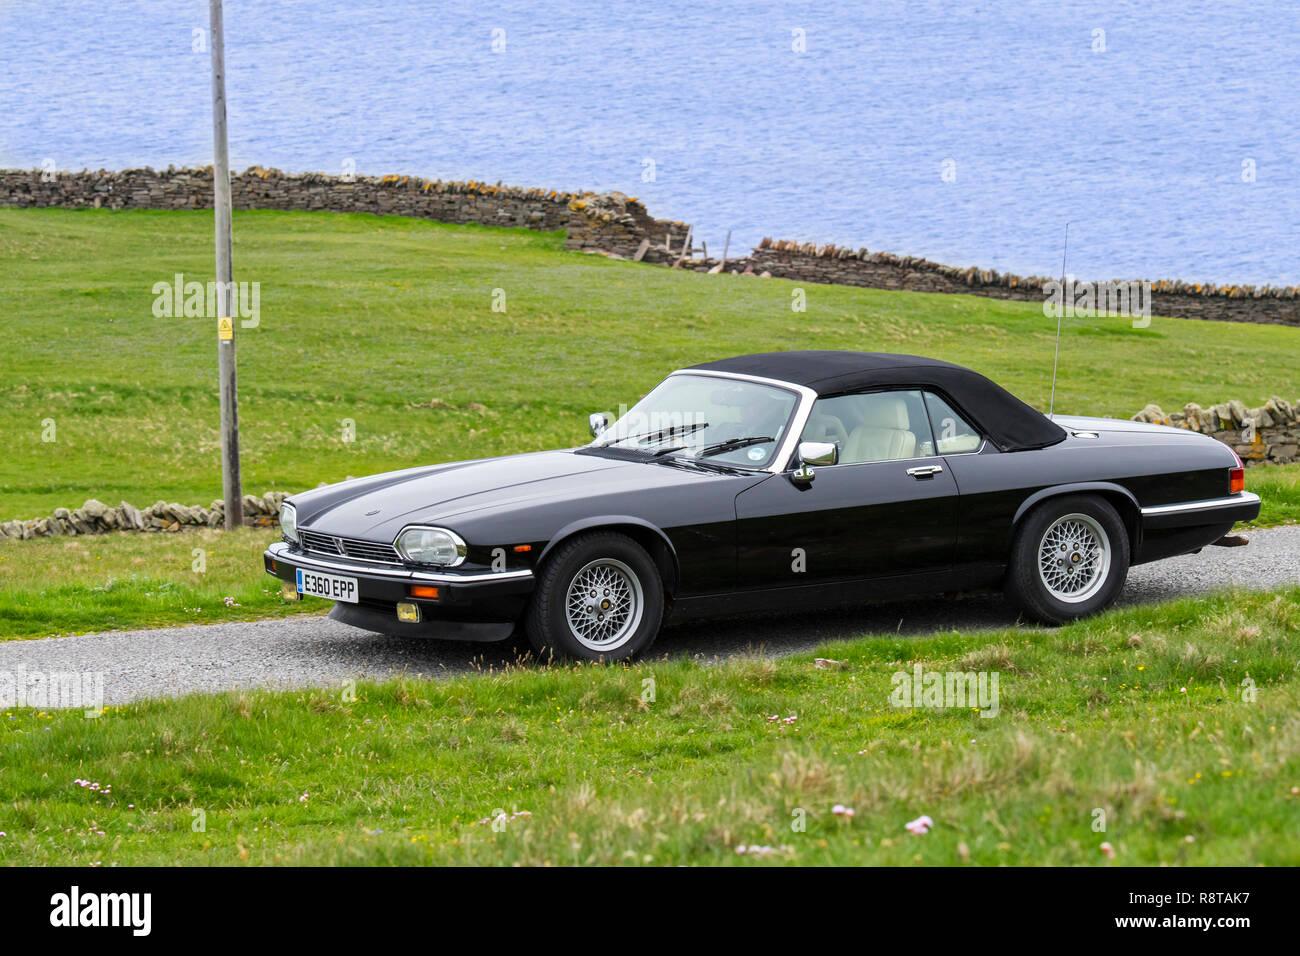 Black 1988 Jaguar XJ-S V12 convertible classic sports car driving along coastal road - Stock Image